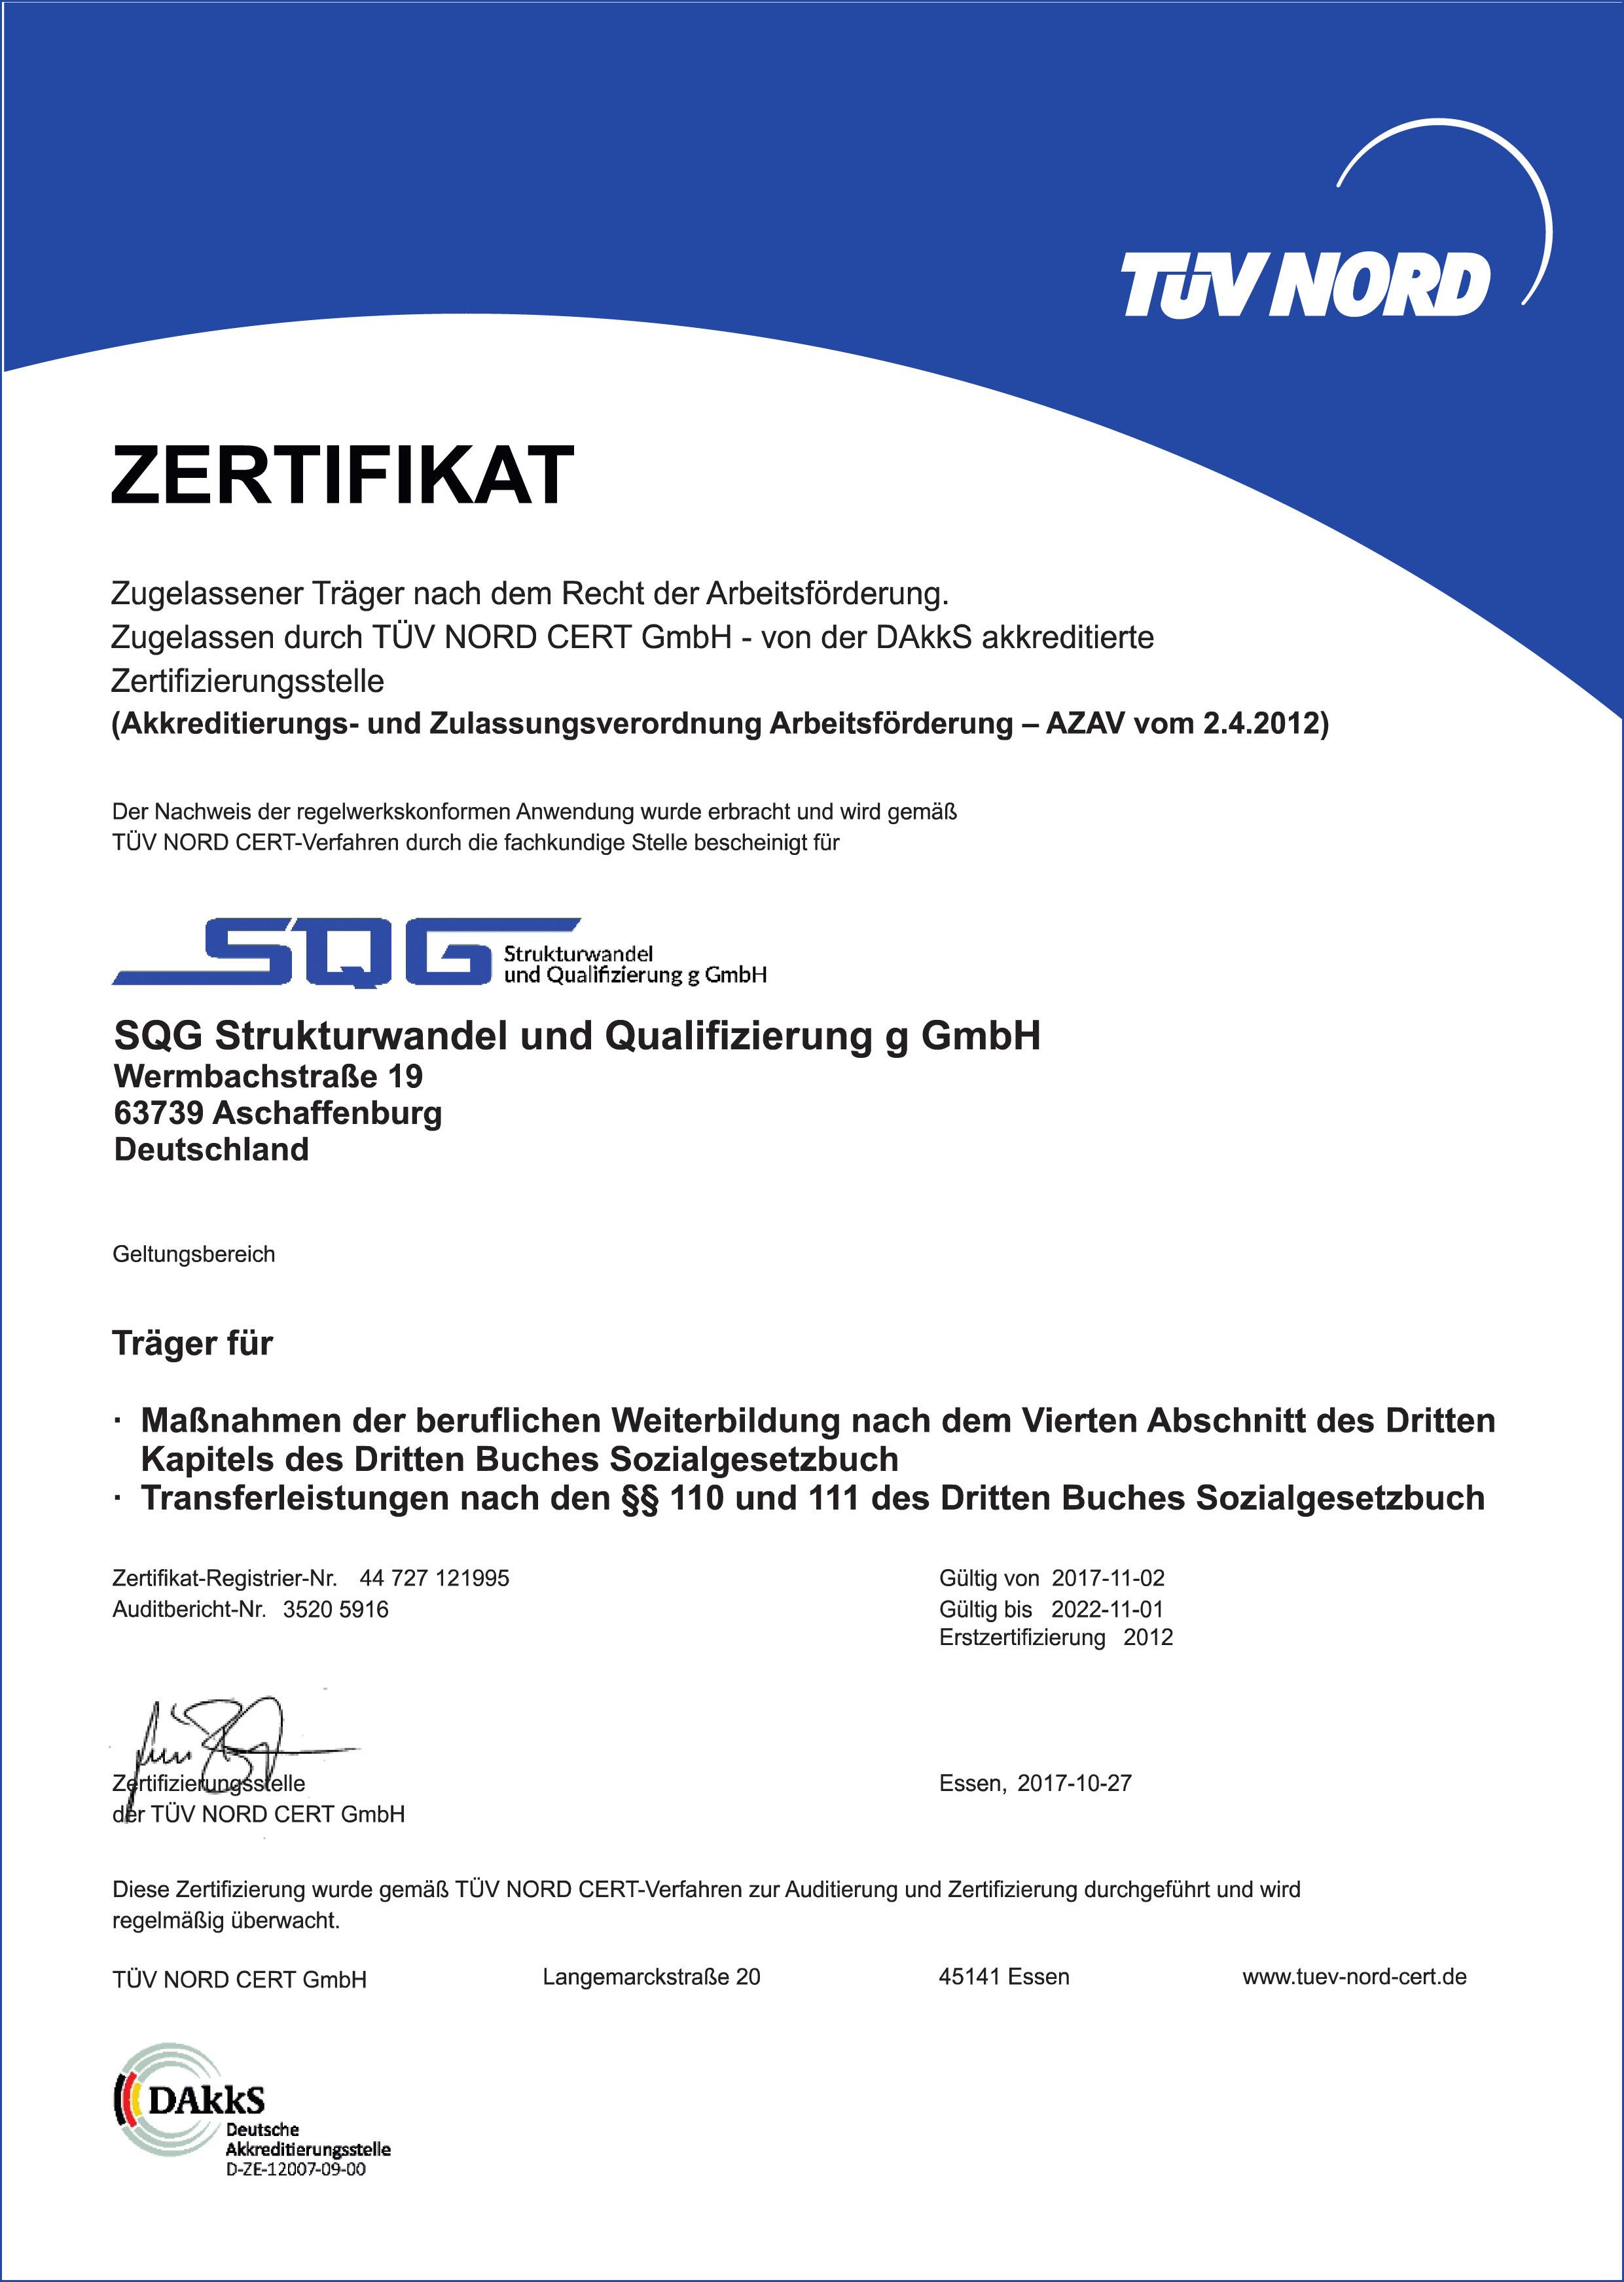 Zertifikat_121995-SQG_02.11.2017-gGmbH